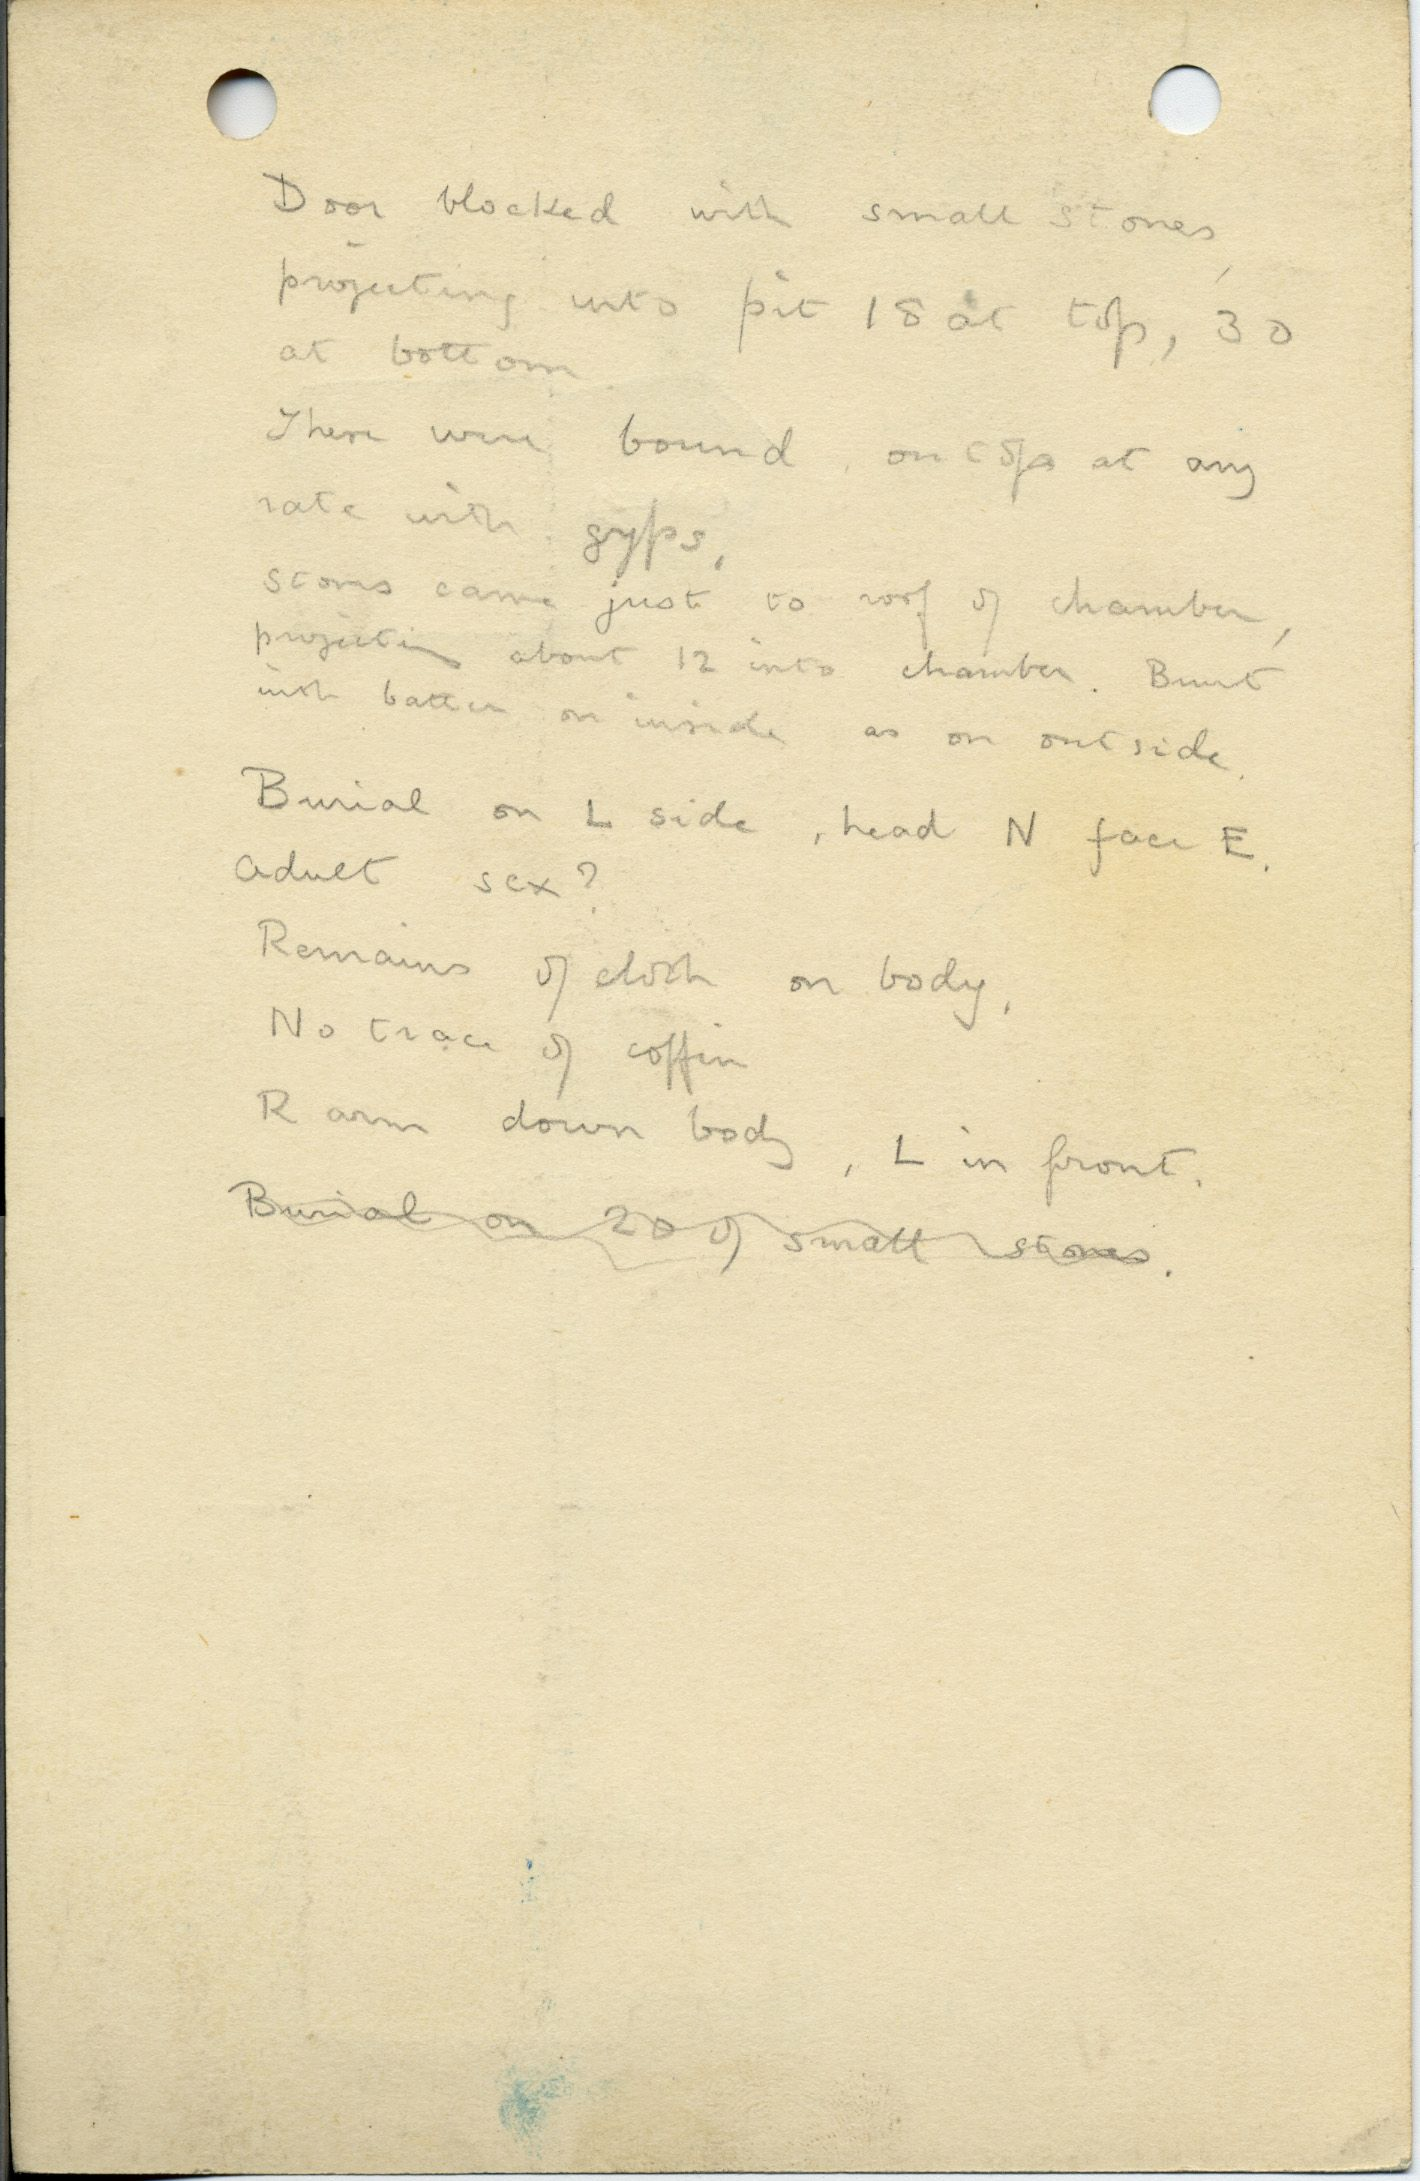 Notes: G 1043, Shaft D, notes